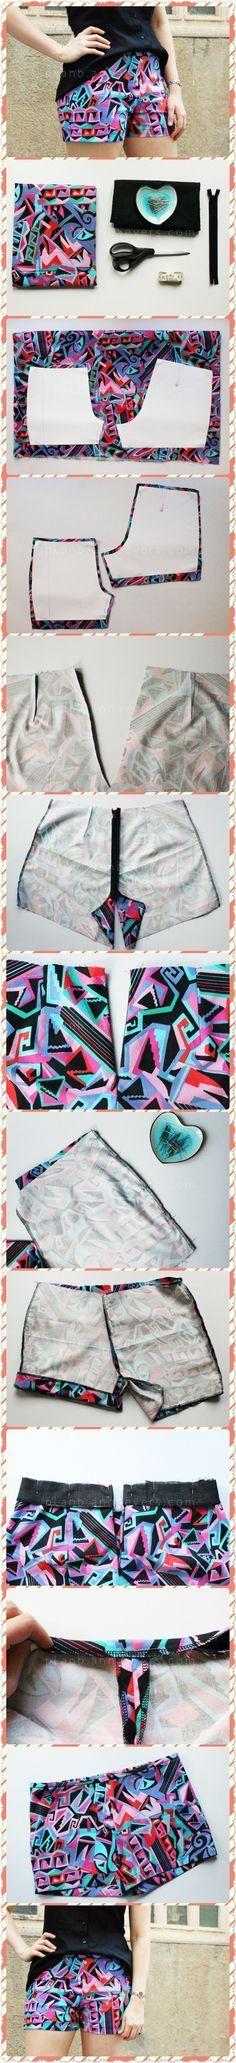 DIY shorts free pattern smallmed size 2 piece pattern Zipper no pockets Sewing Patterns Free, Free Sewing, Clothing Patterns, Free Pattern, Short Pattern, Sewing Hacks, Sewing Tutorials, Sewing Crafts, Sewing Projects